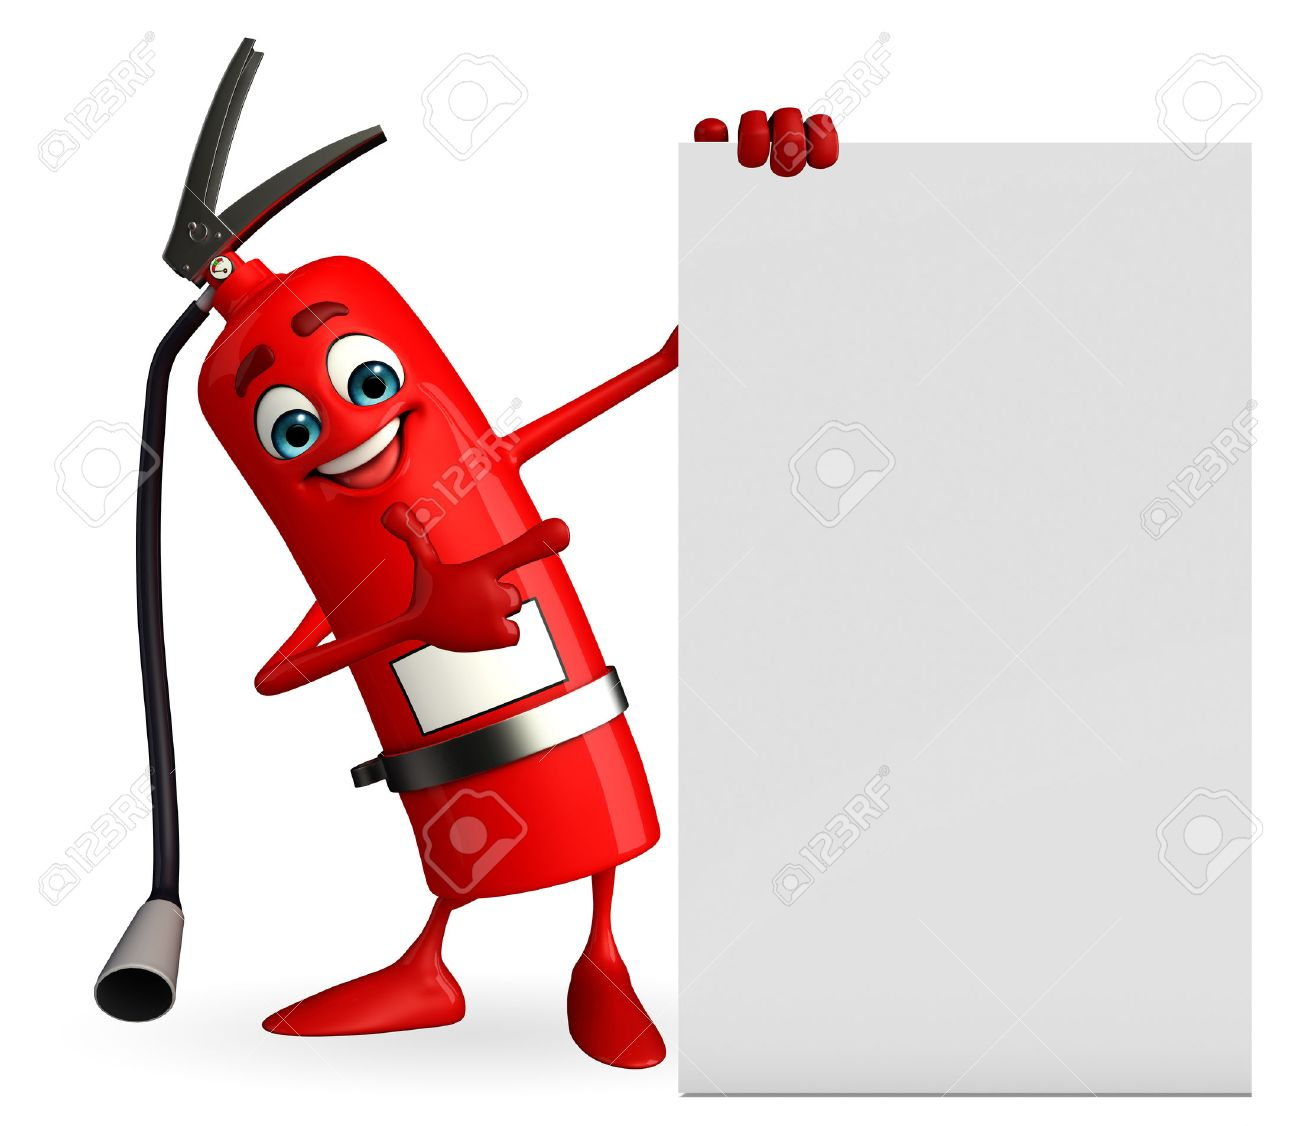 Fire Extinguisher Cartoon